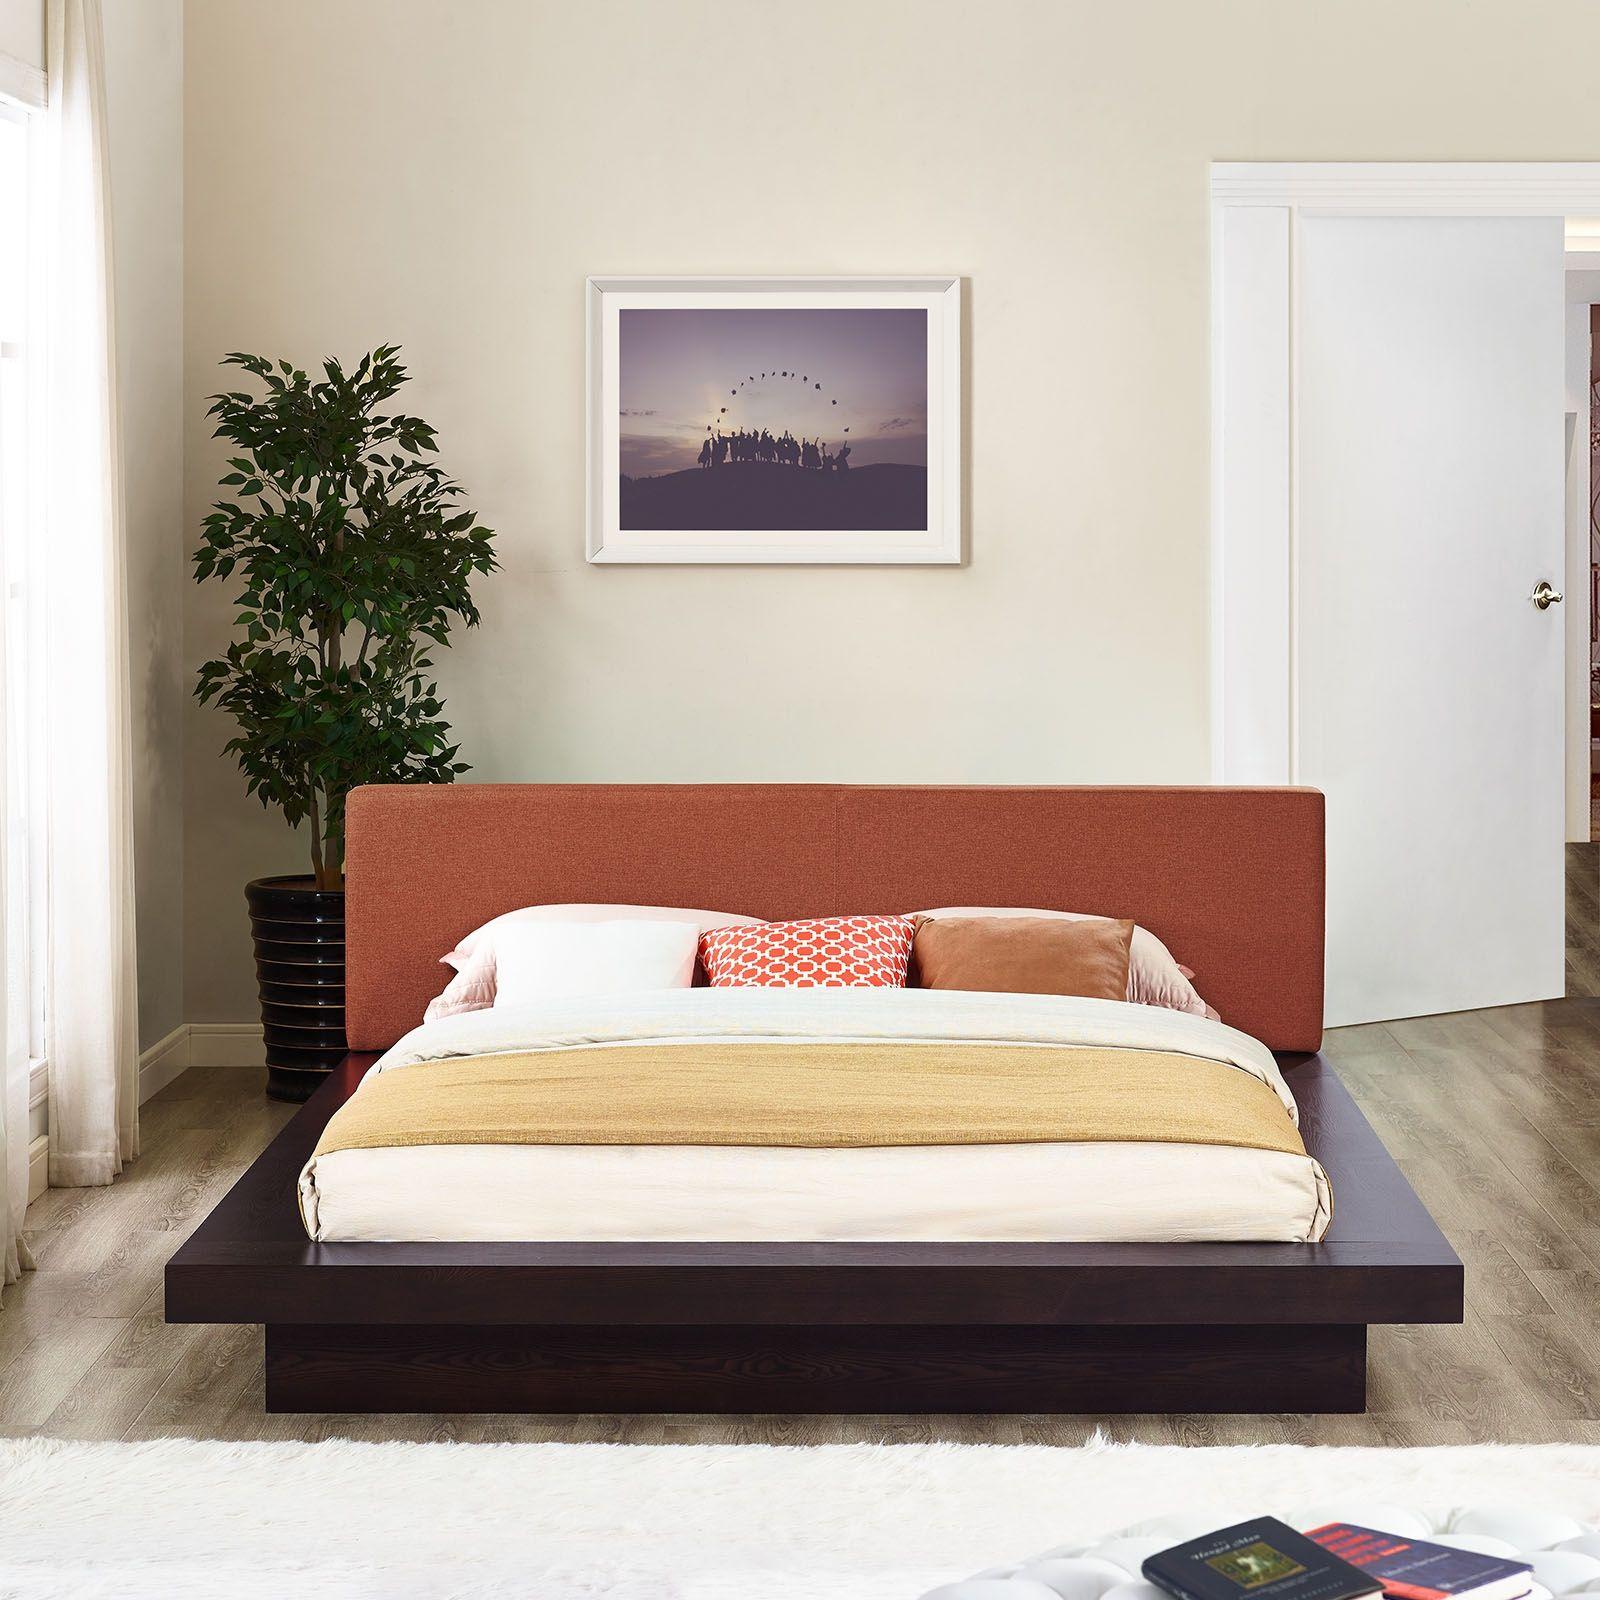 Modway 5721 cappuccino queen platform bed w orange fabric headboard